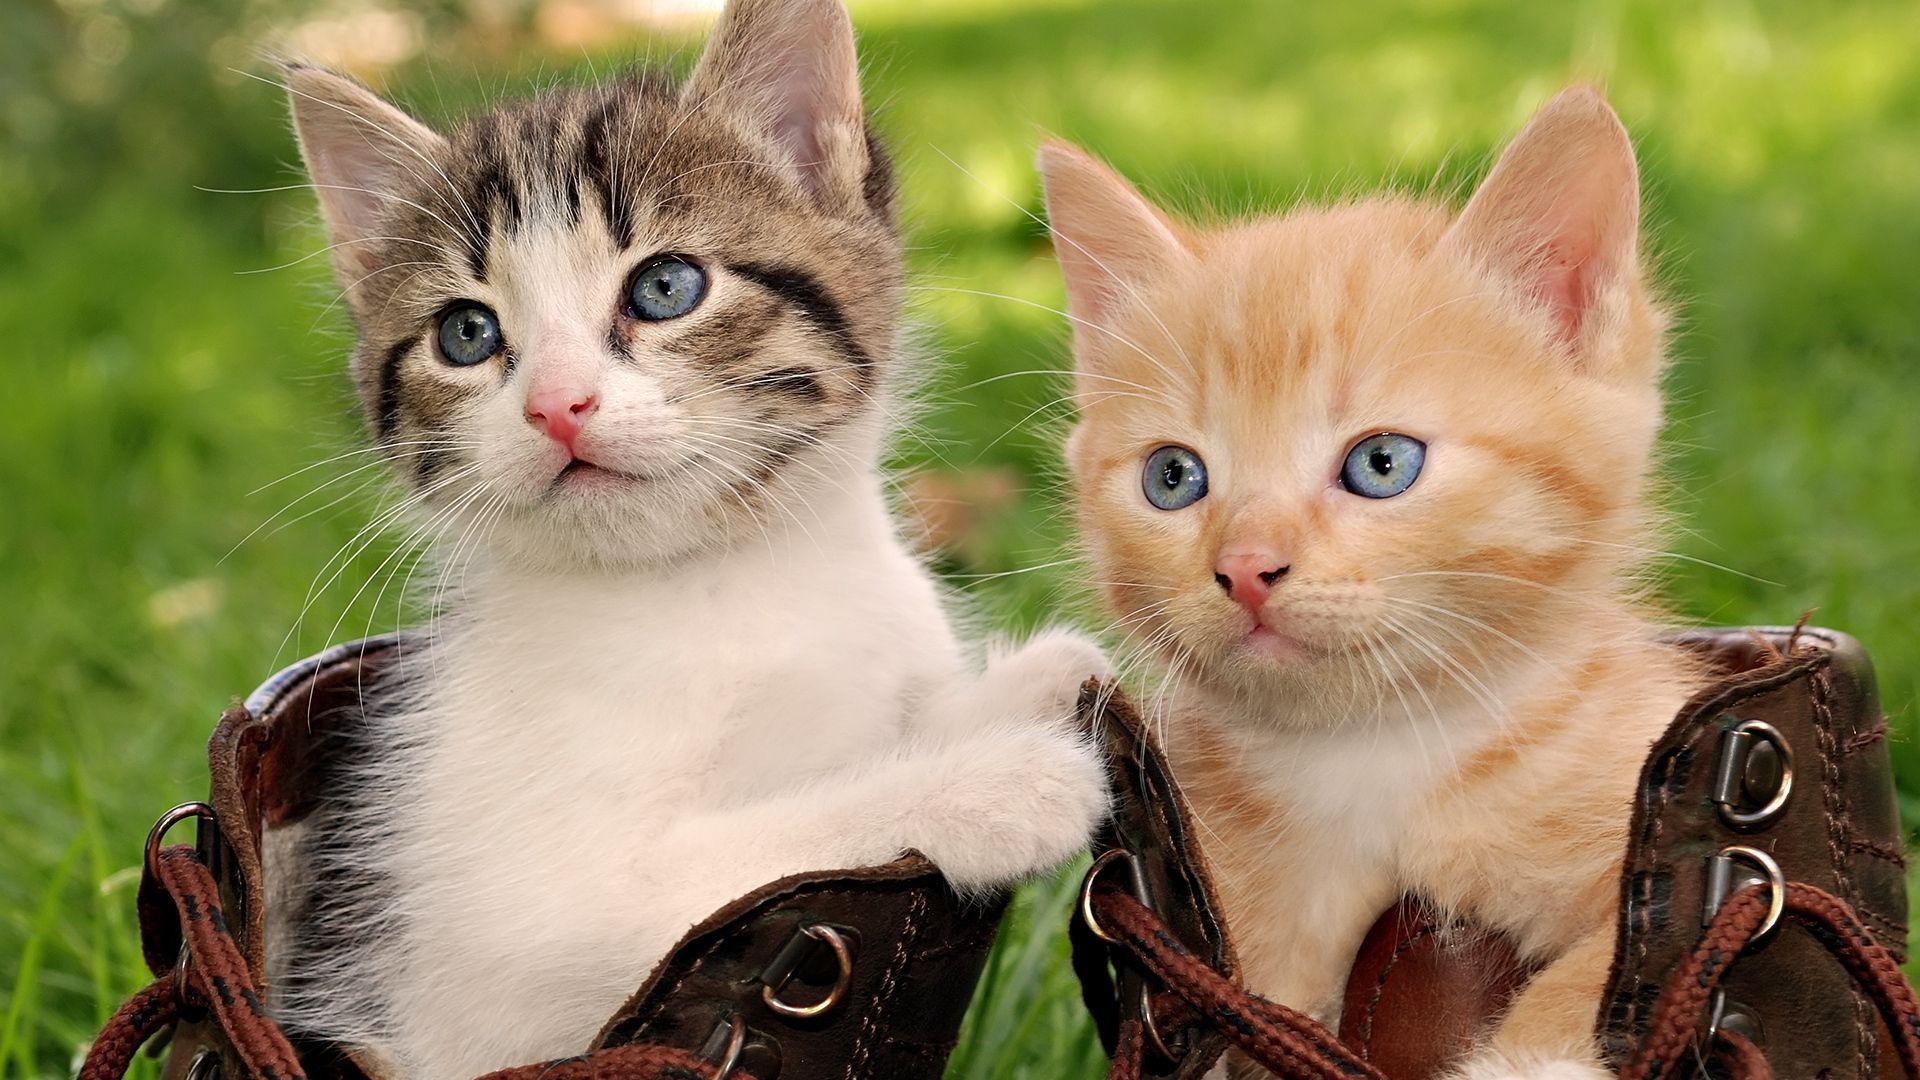 Cat Images Full Hd Wallpaper